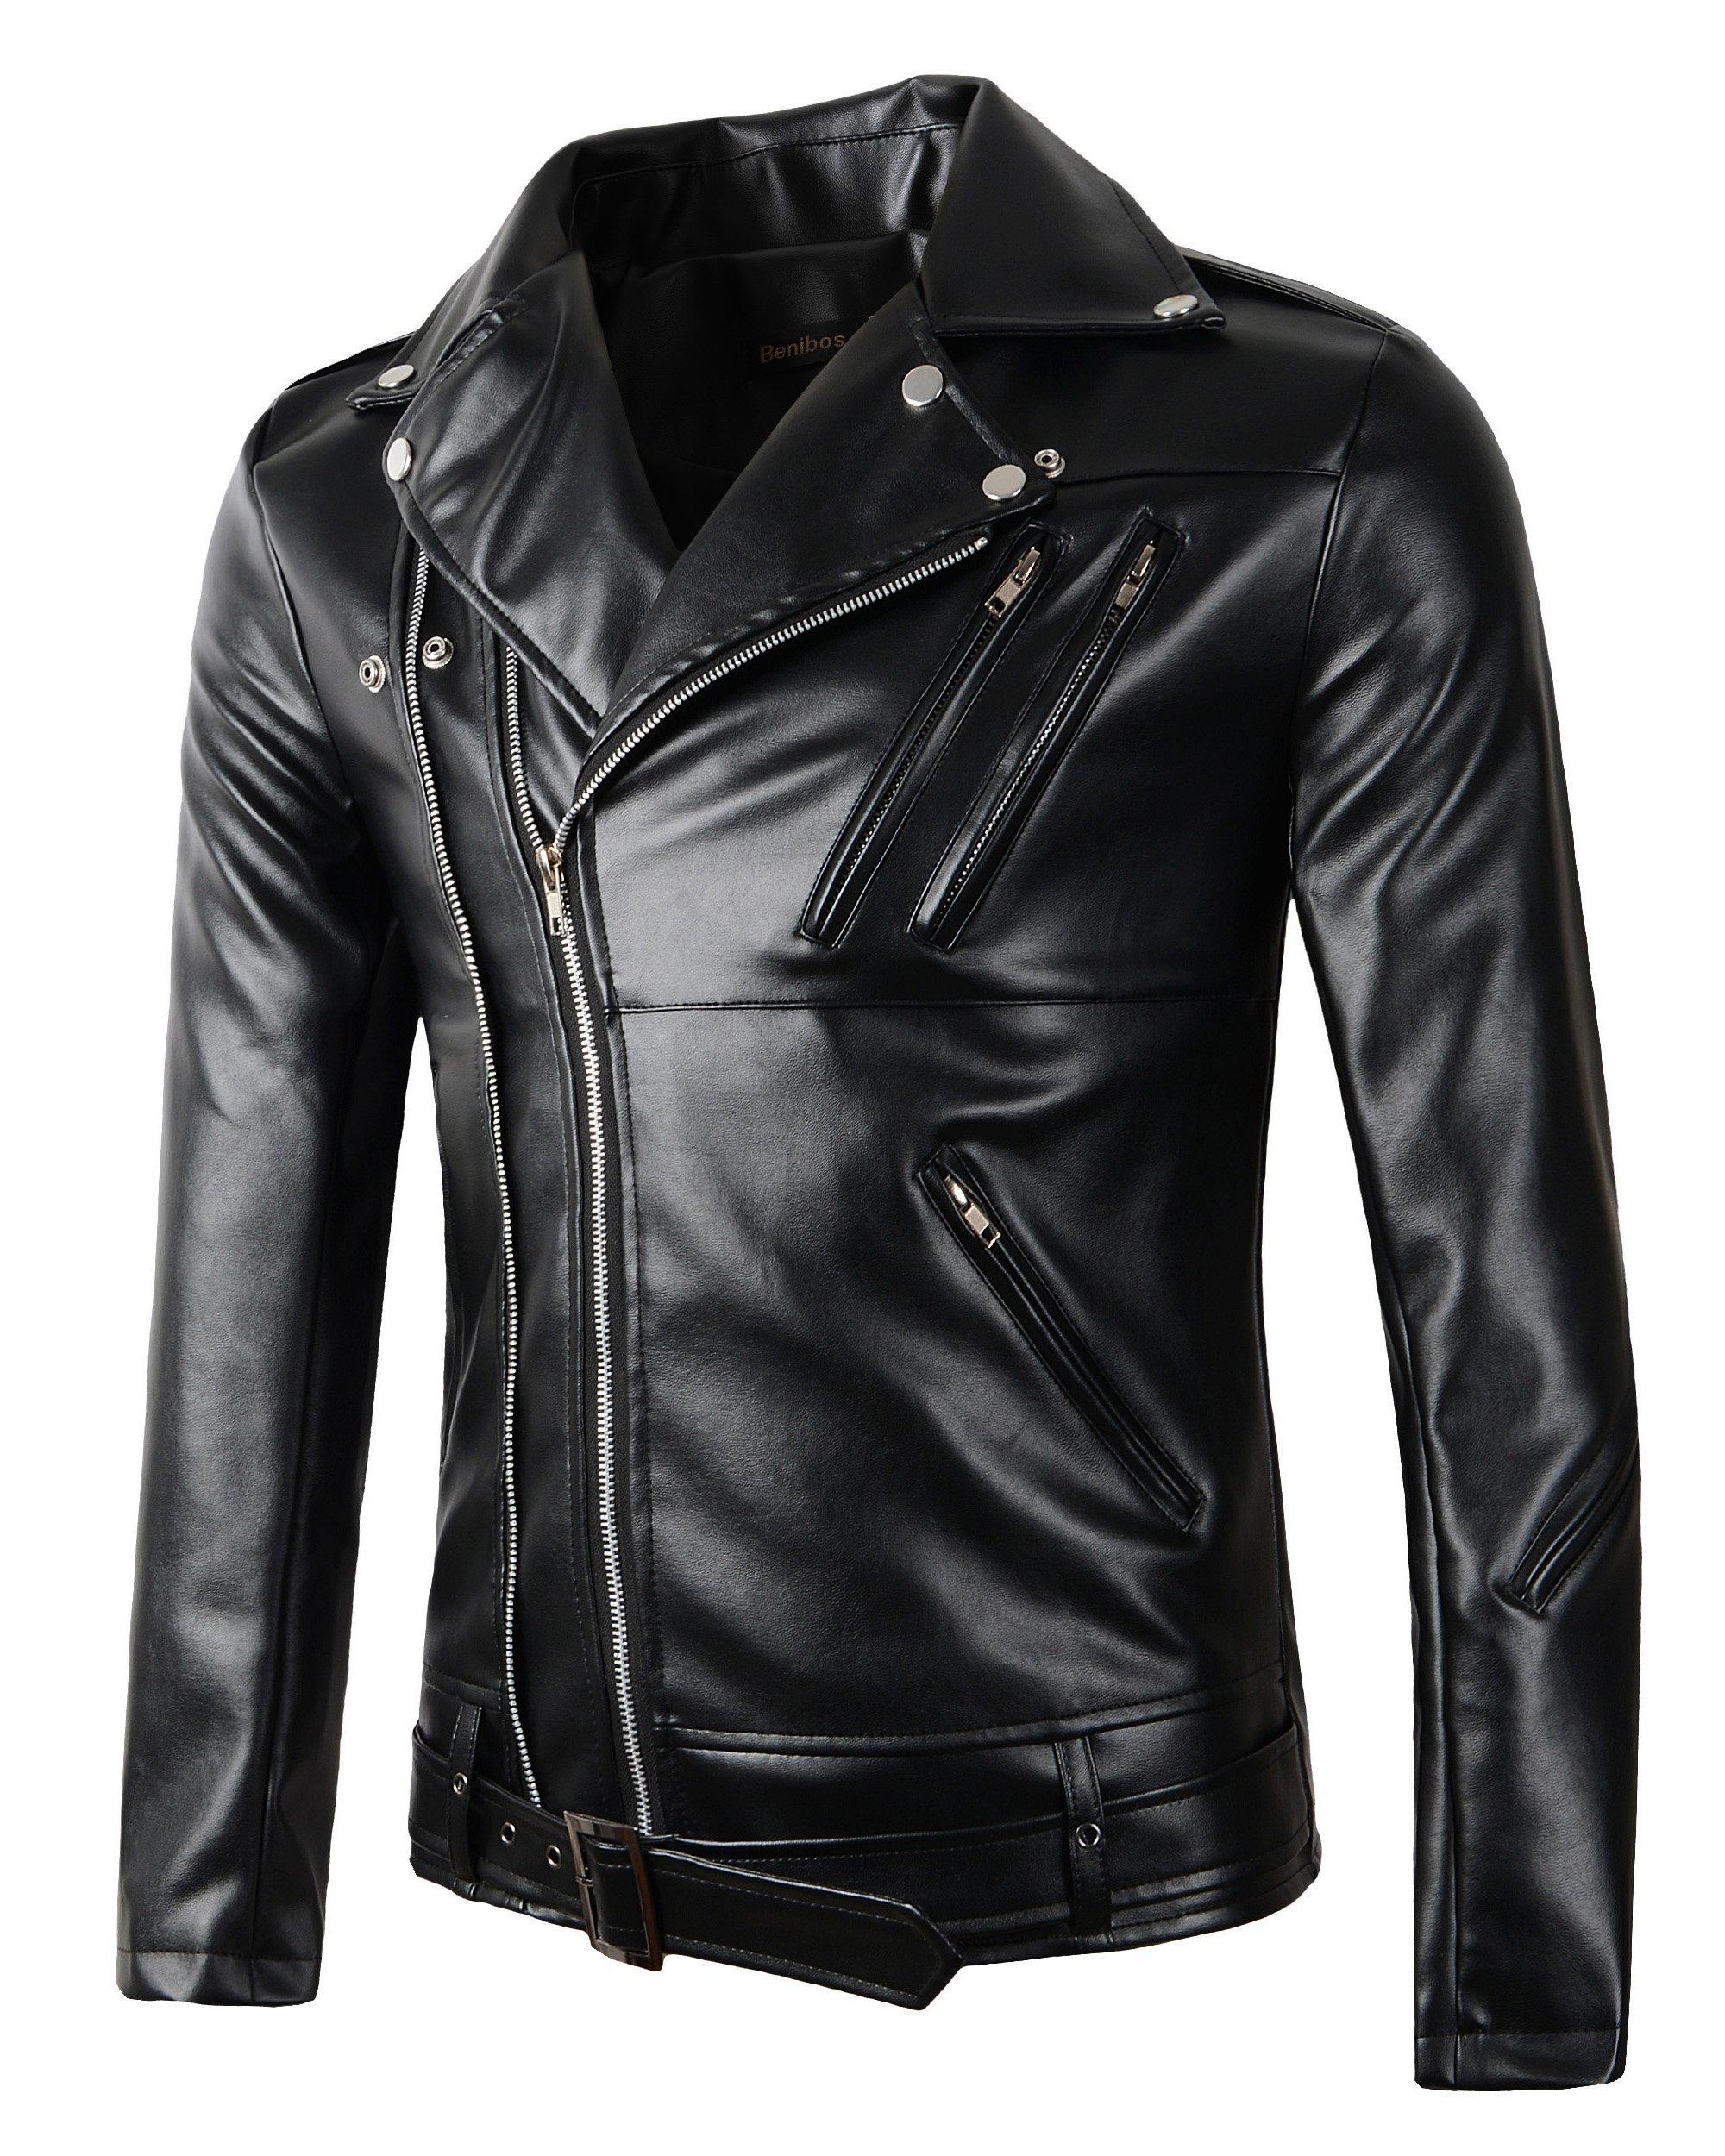 New Mens Causal Belted Design Slim Pu Leather Biker Zipper Jacket Coat (Large), Black by Beninos